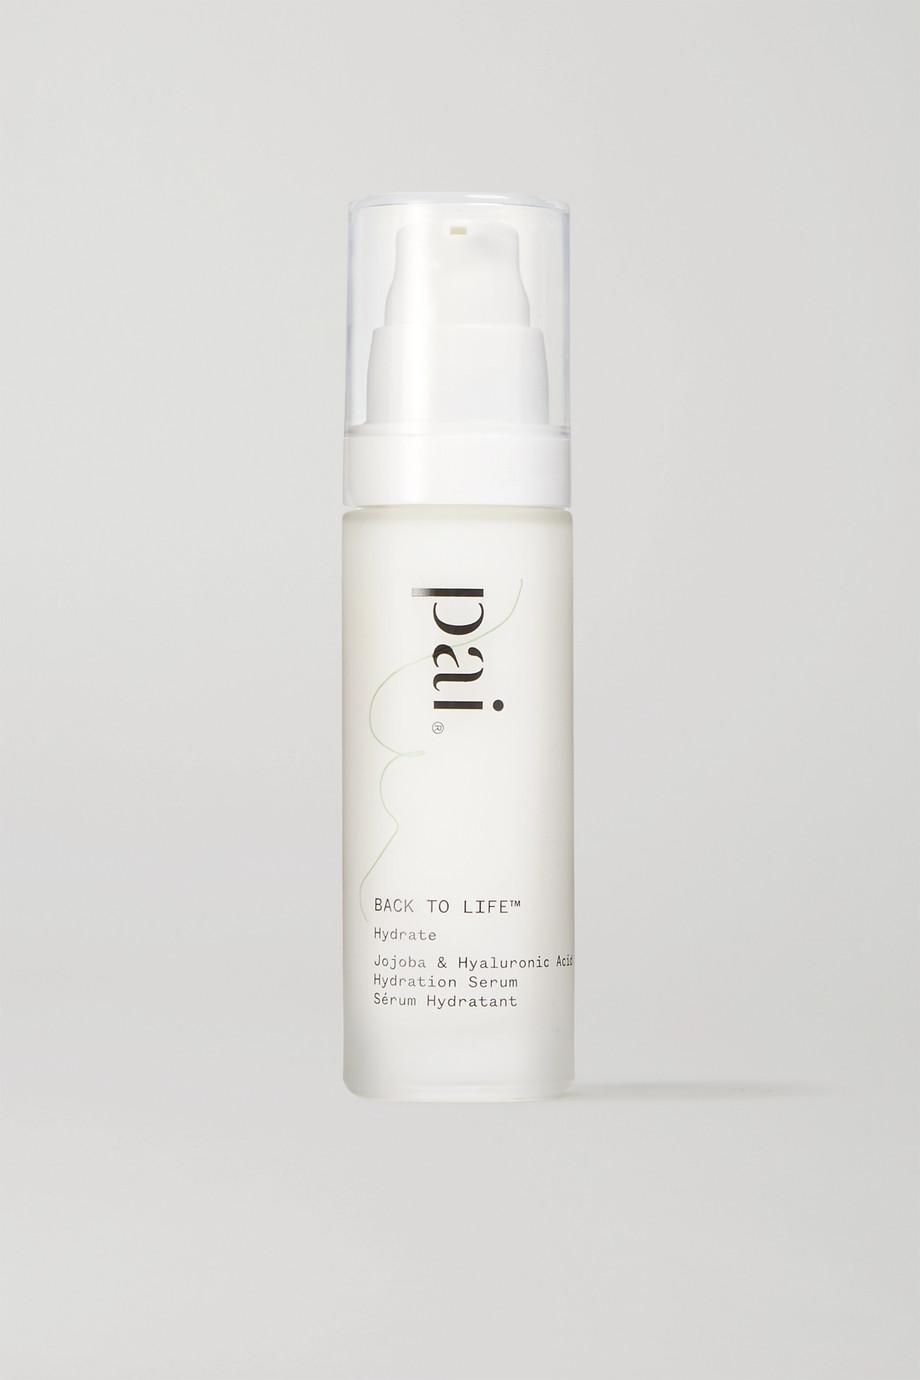 Pai Skincare 【NET SUSTAIN】恢复生机保湿精华液,30ml